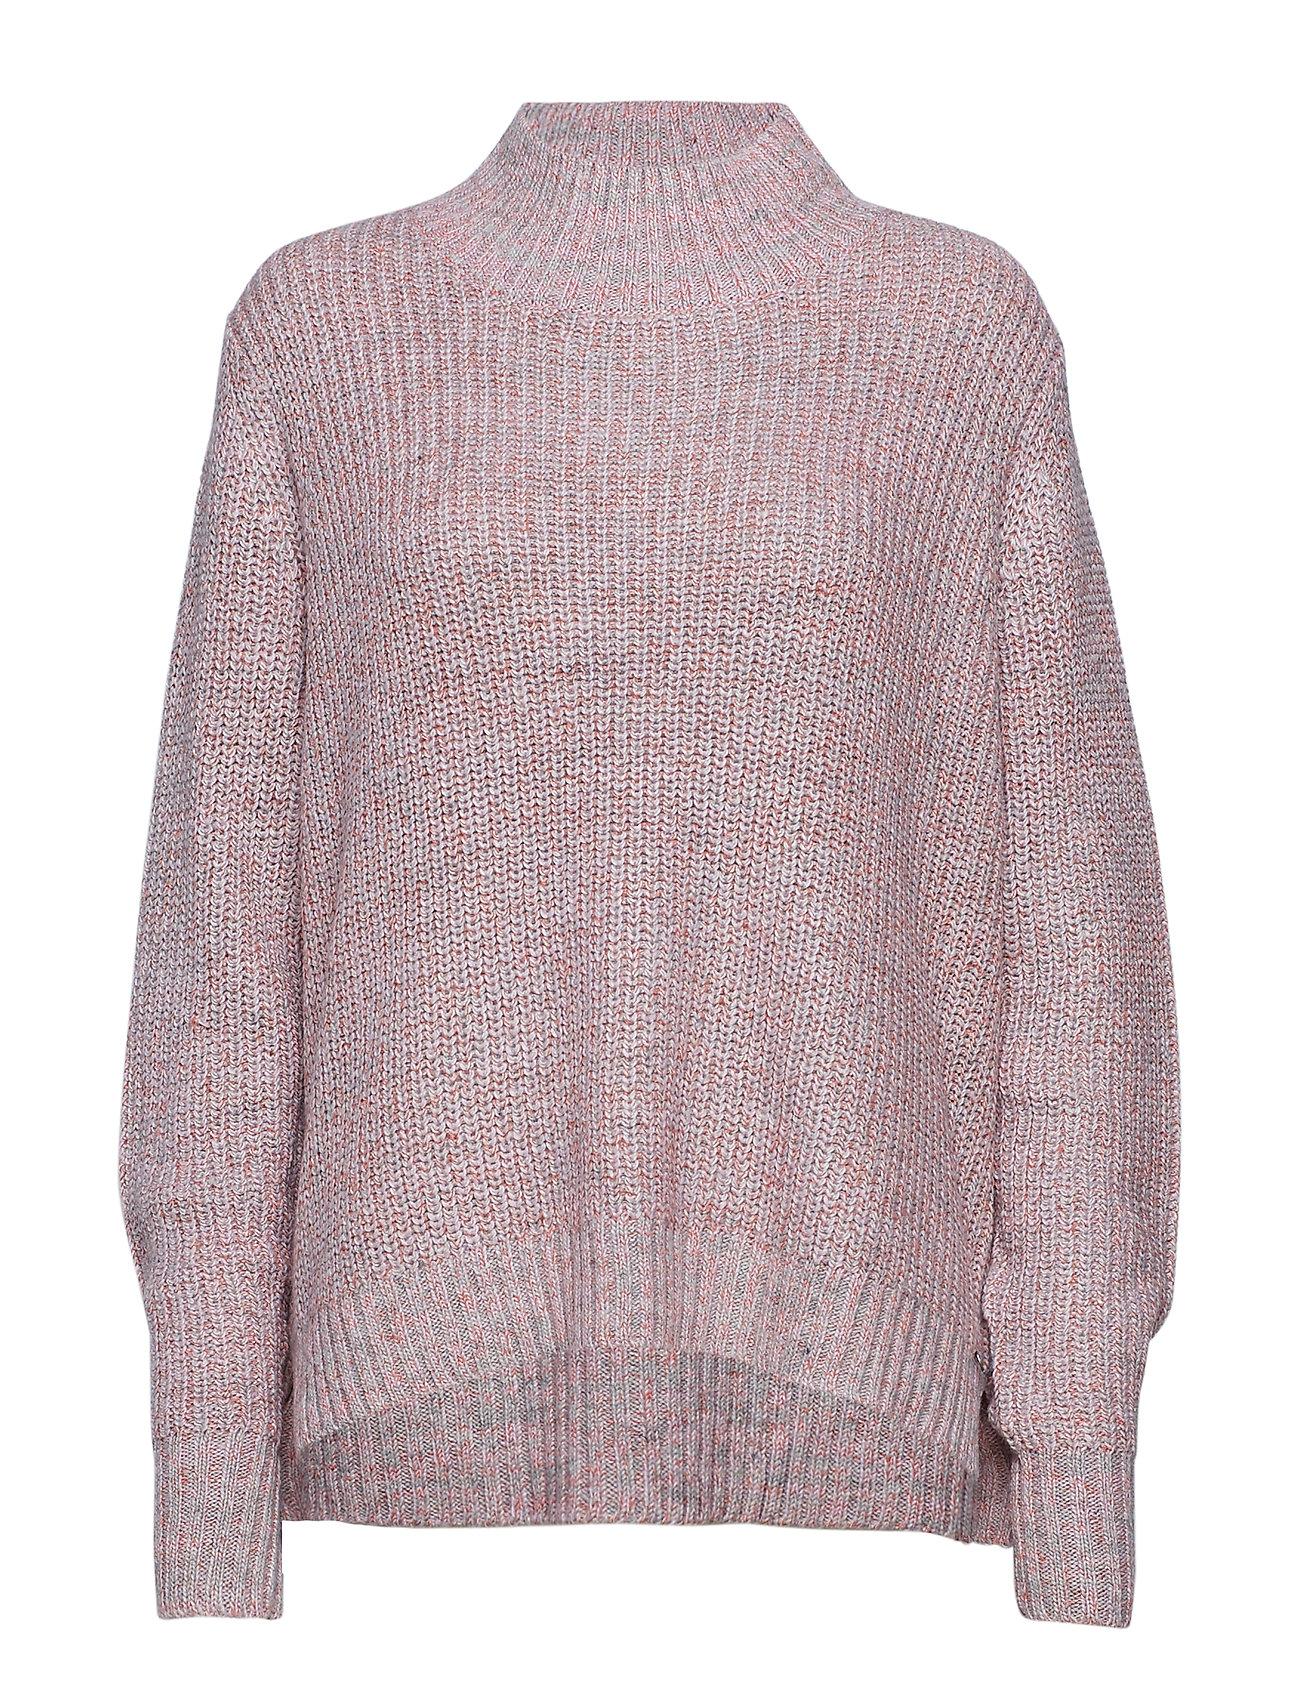 Sweater In Woolmix W. Turtleneck - Coster Copenhagen